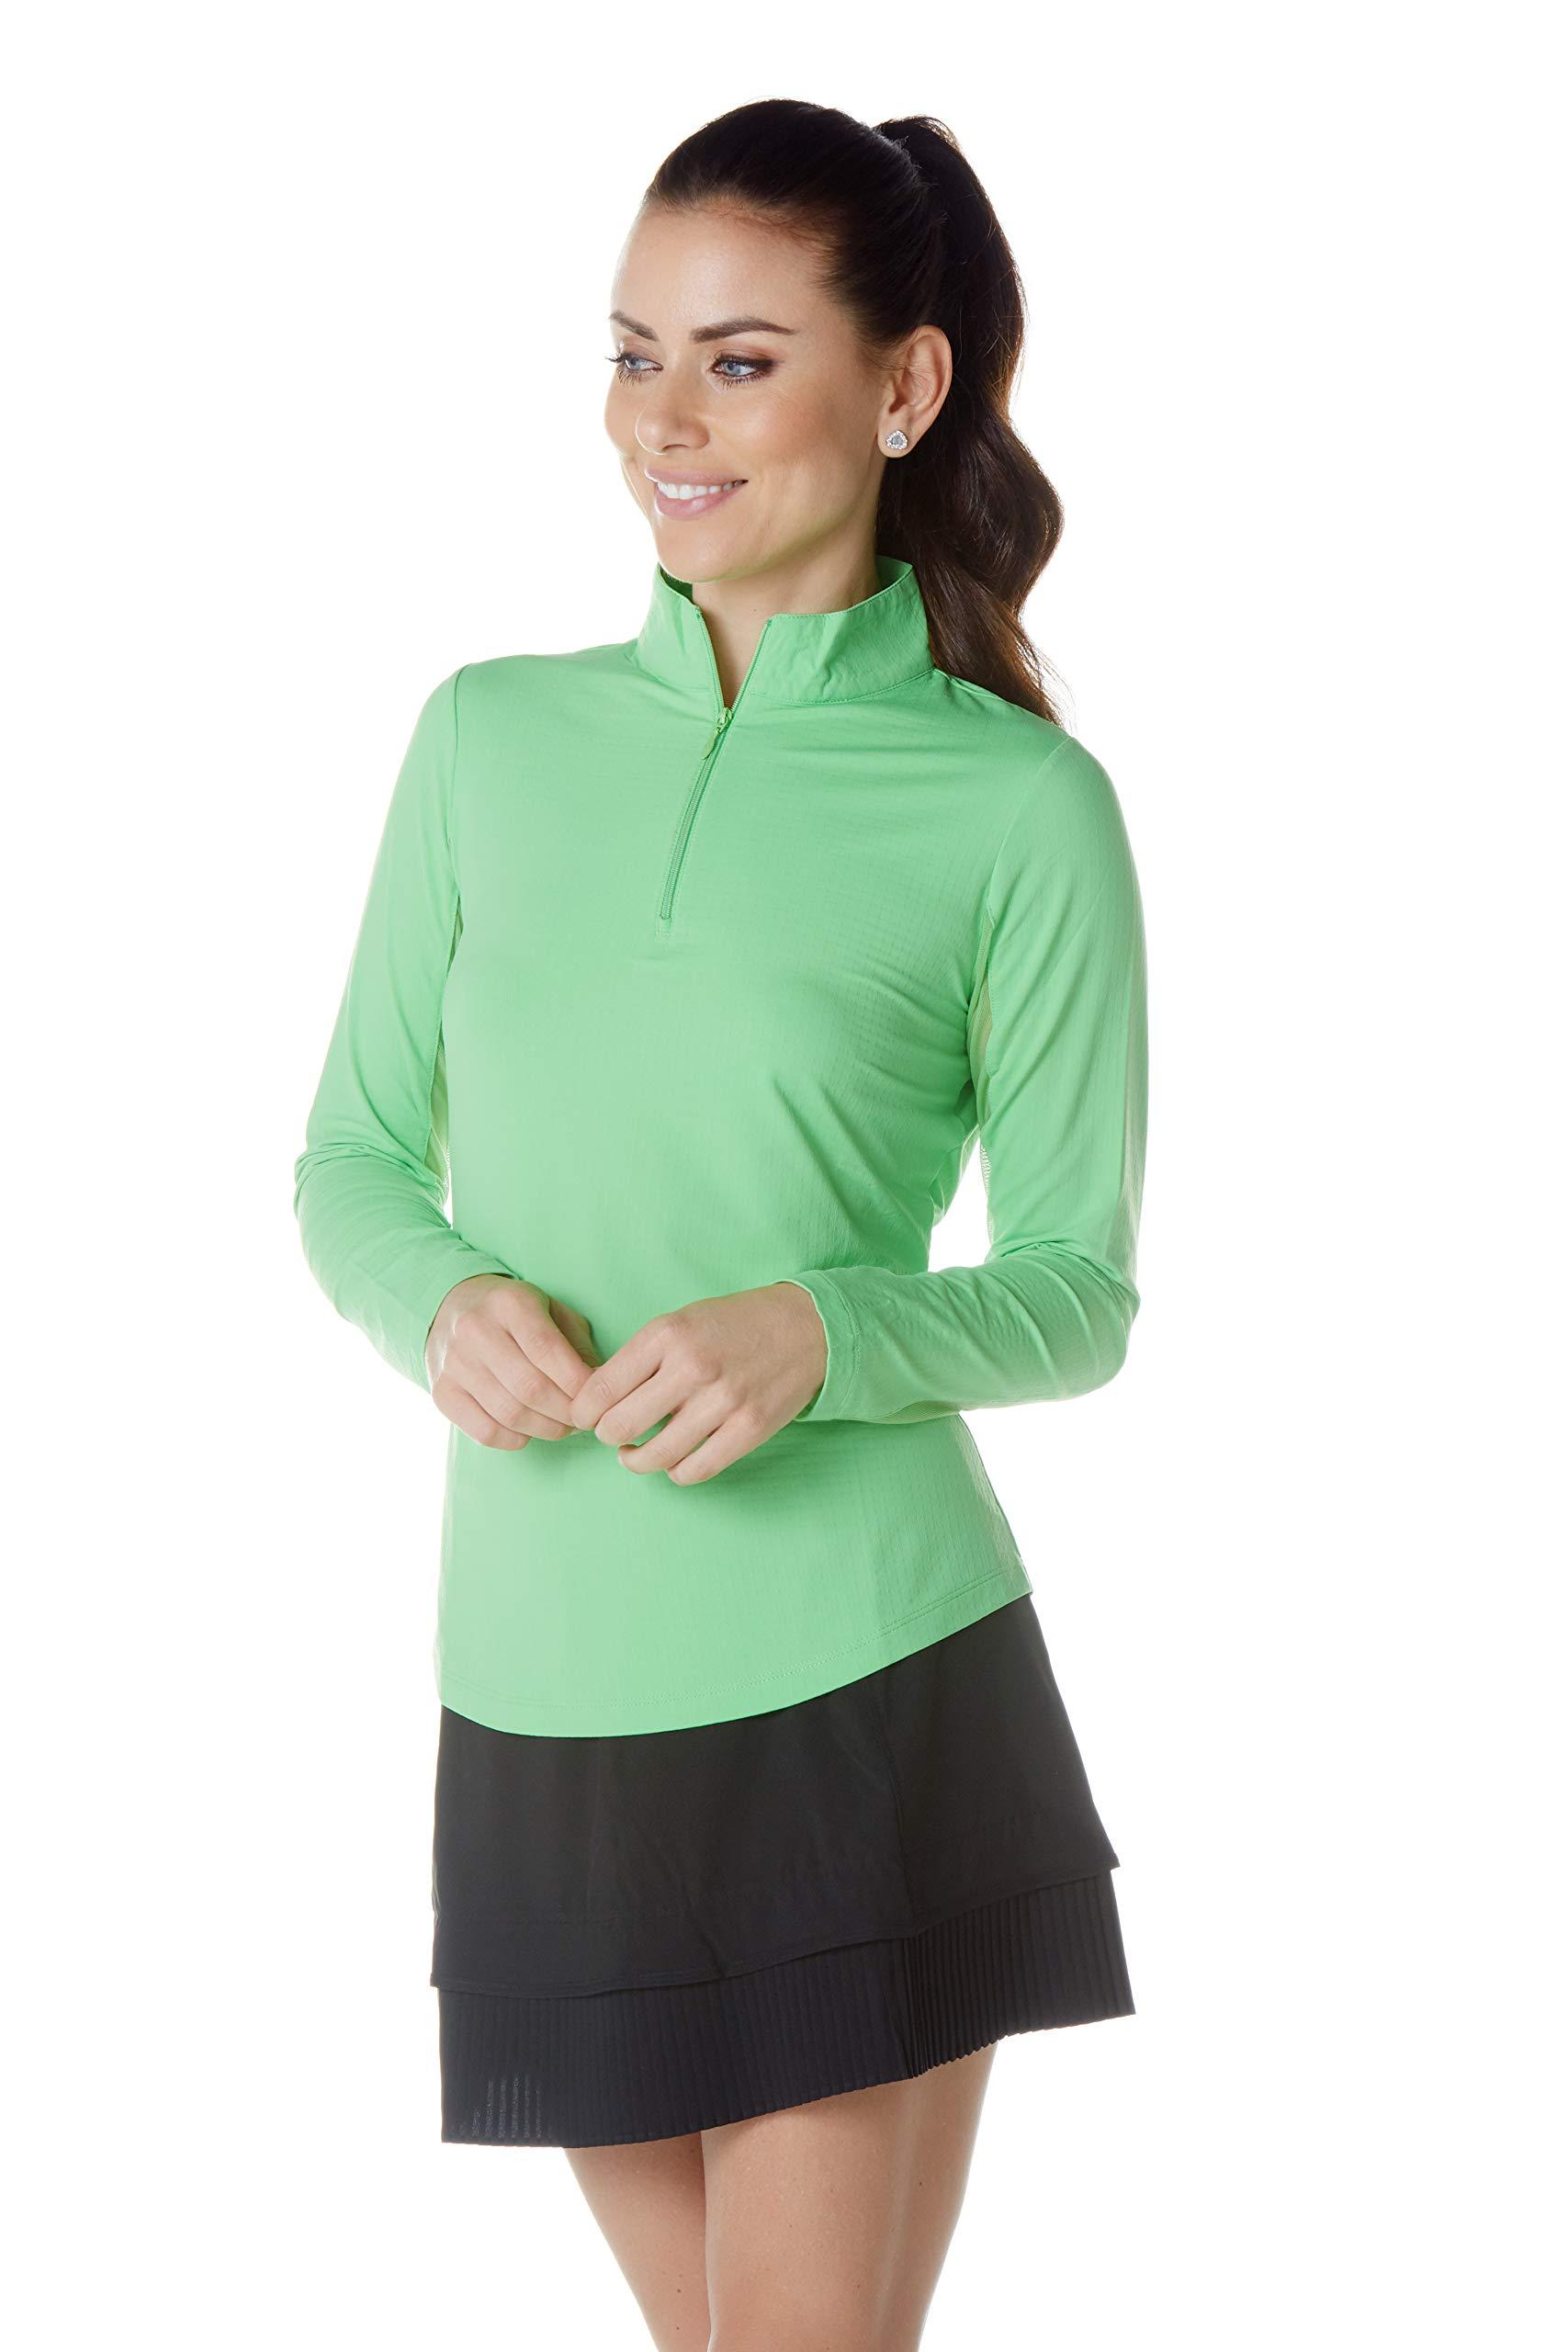 IBKUL Women's Solid Mock Neck Top - 80000 (XL, Lime) by IBKUL